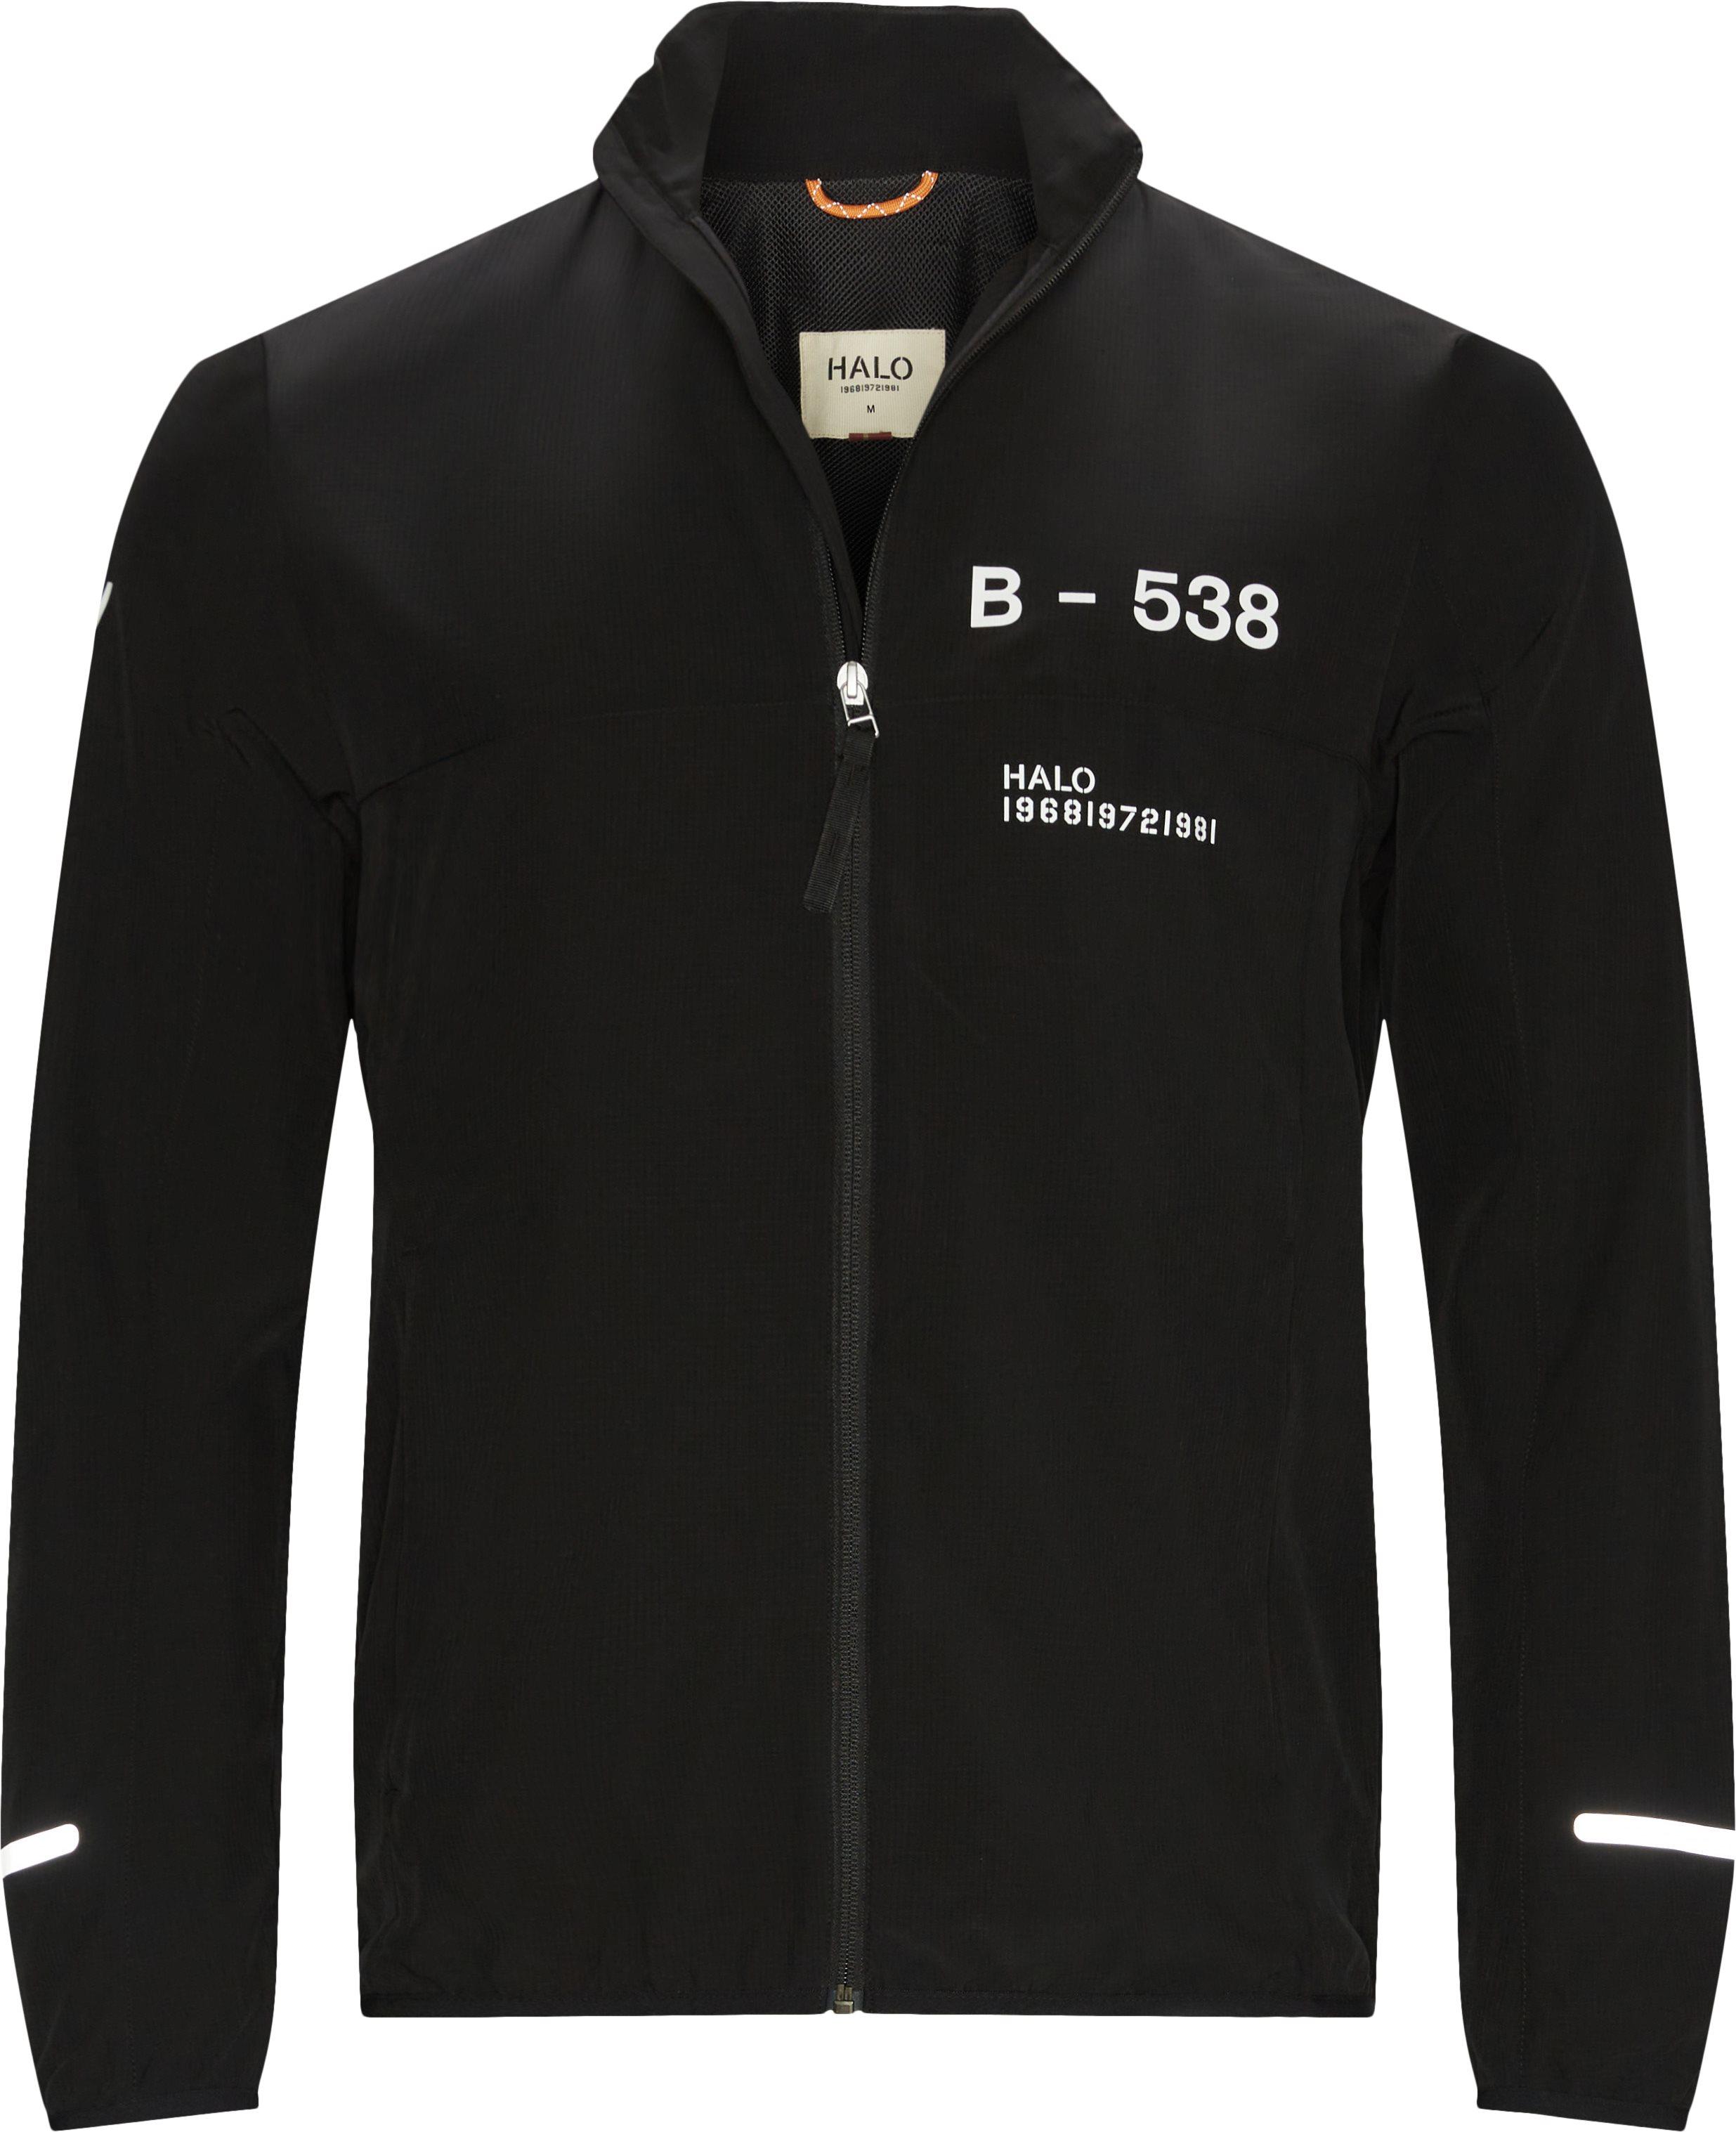 Tech Jacket  - Sweatshirts - Regular fit - Svart